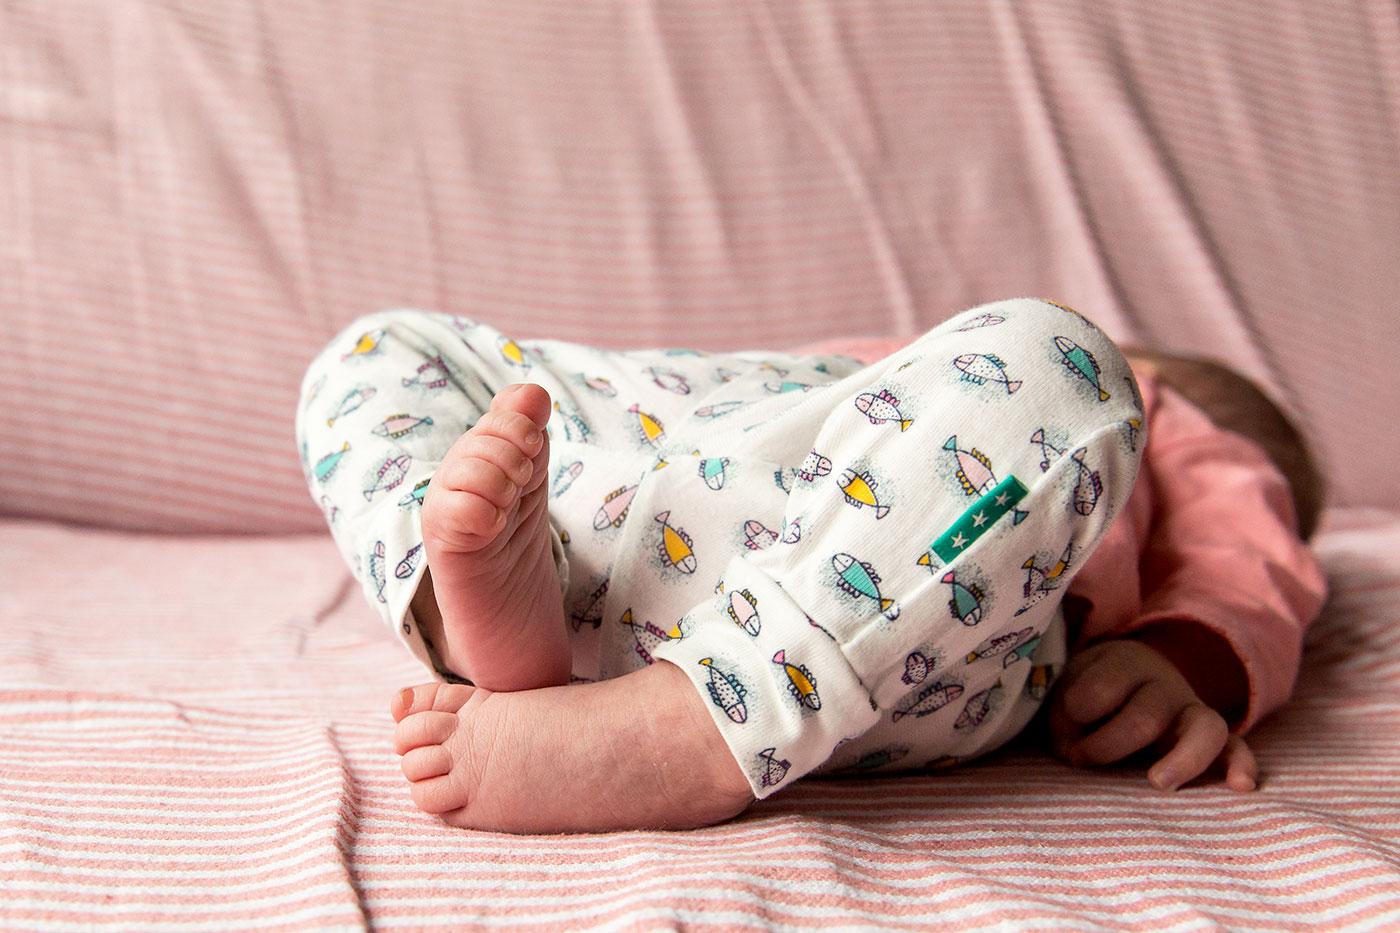 Lifestyle newbornreportage: baby H